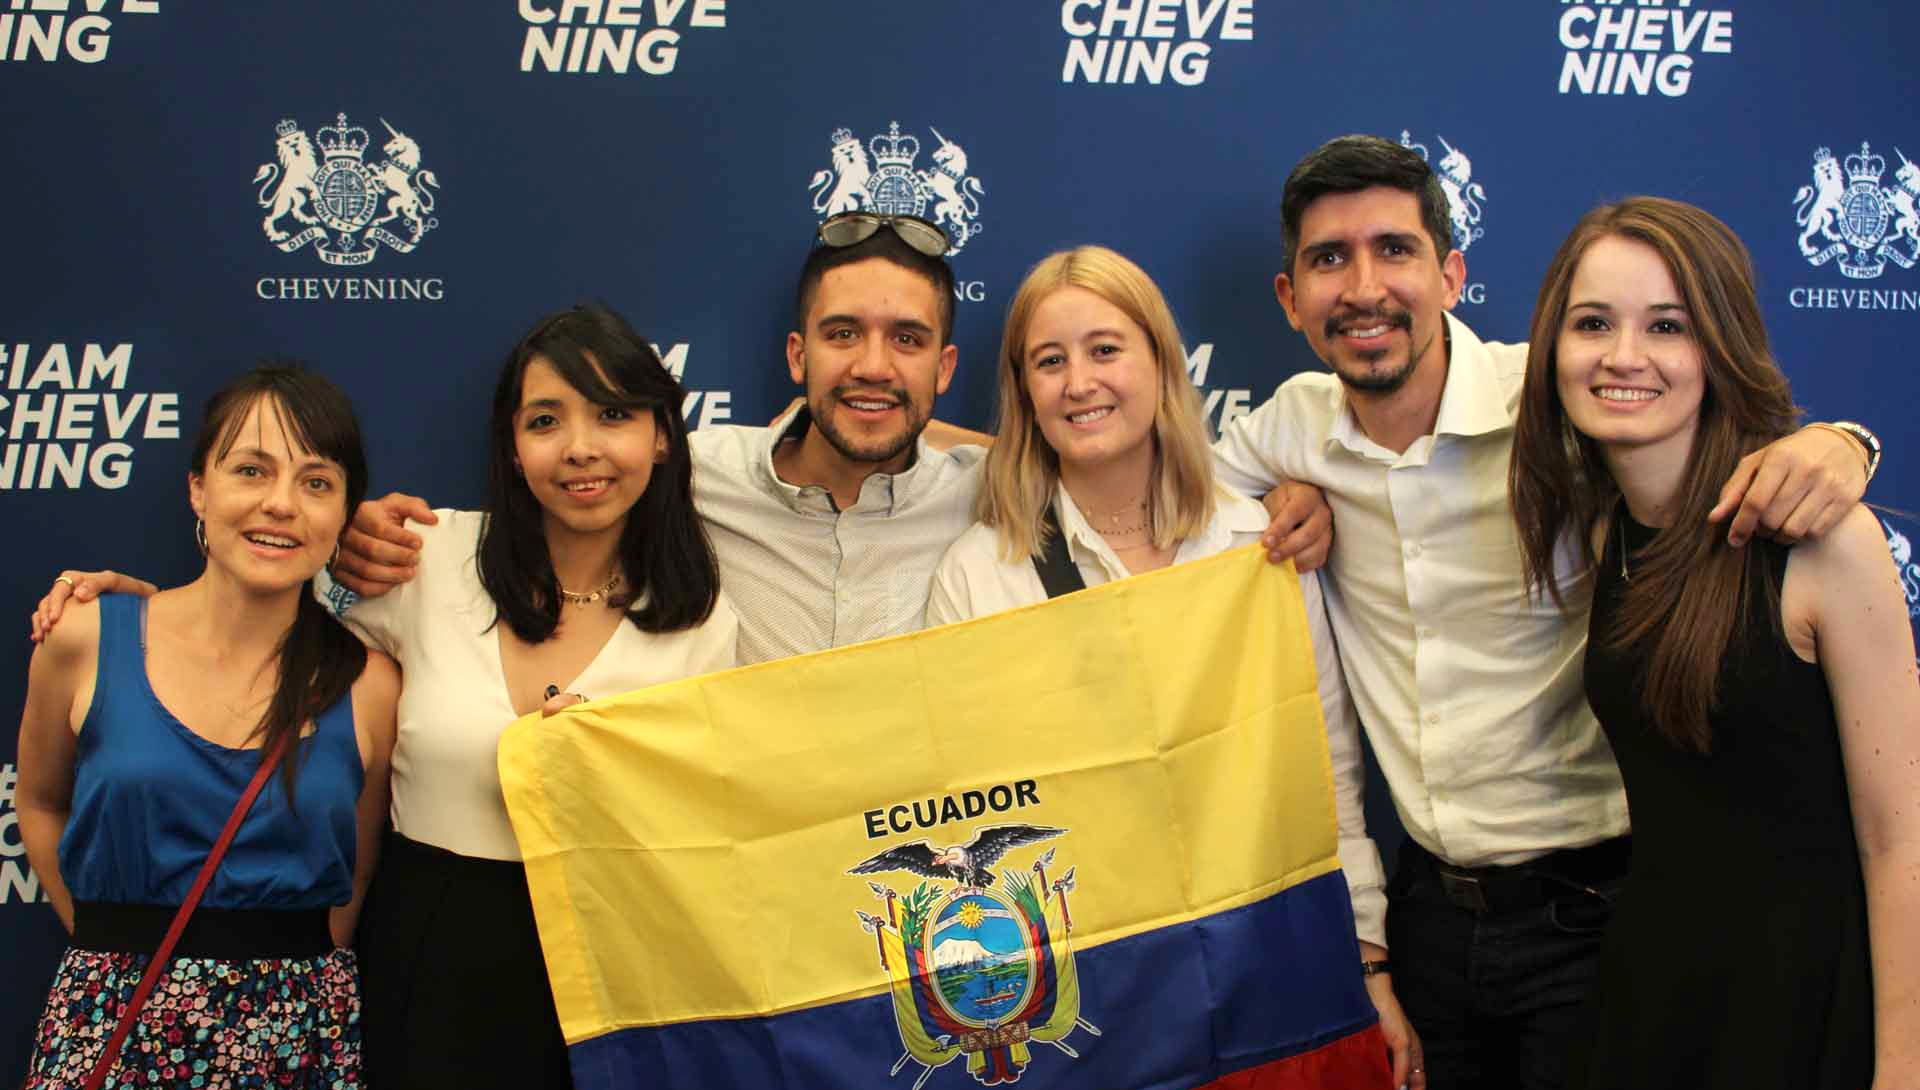 Chevening in Ecuador